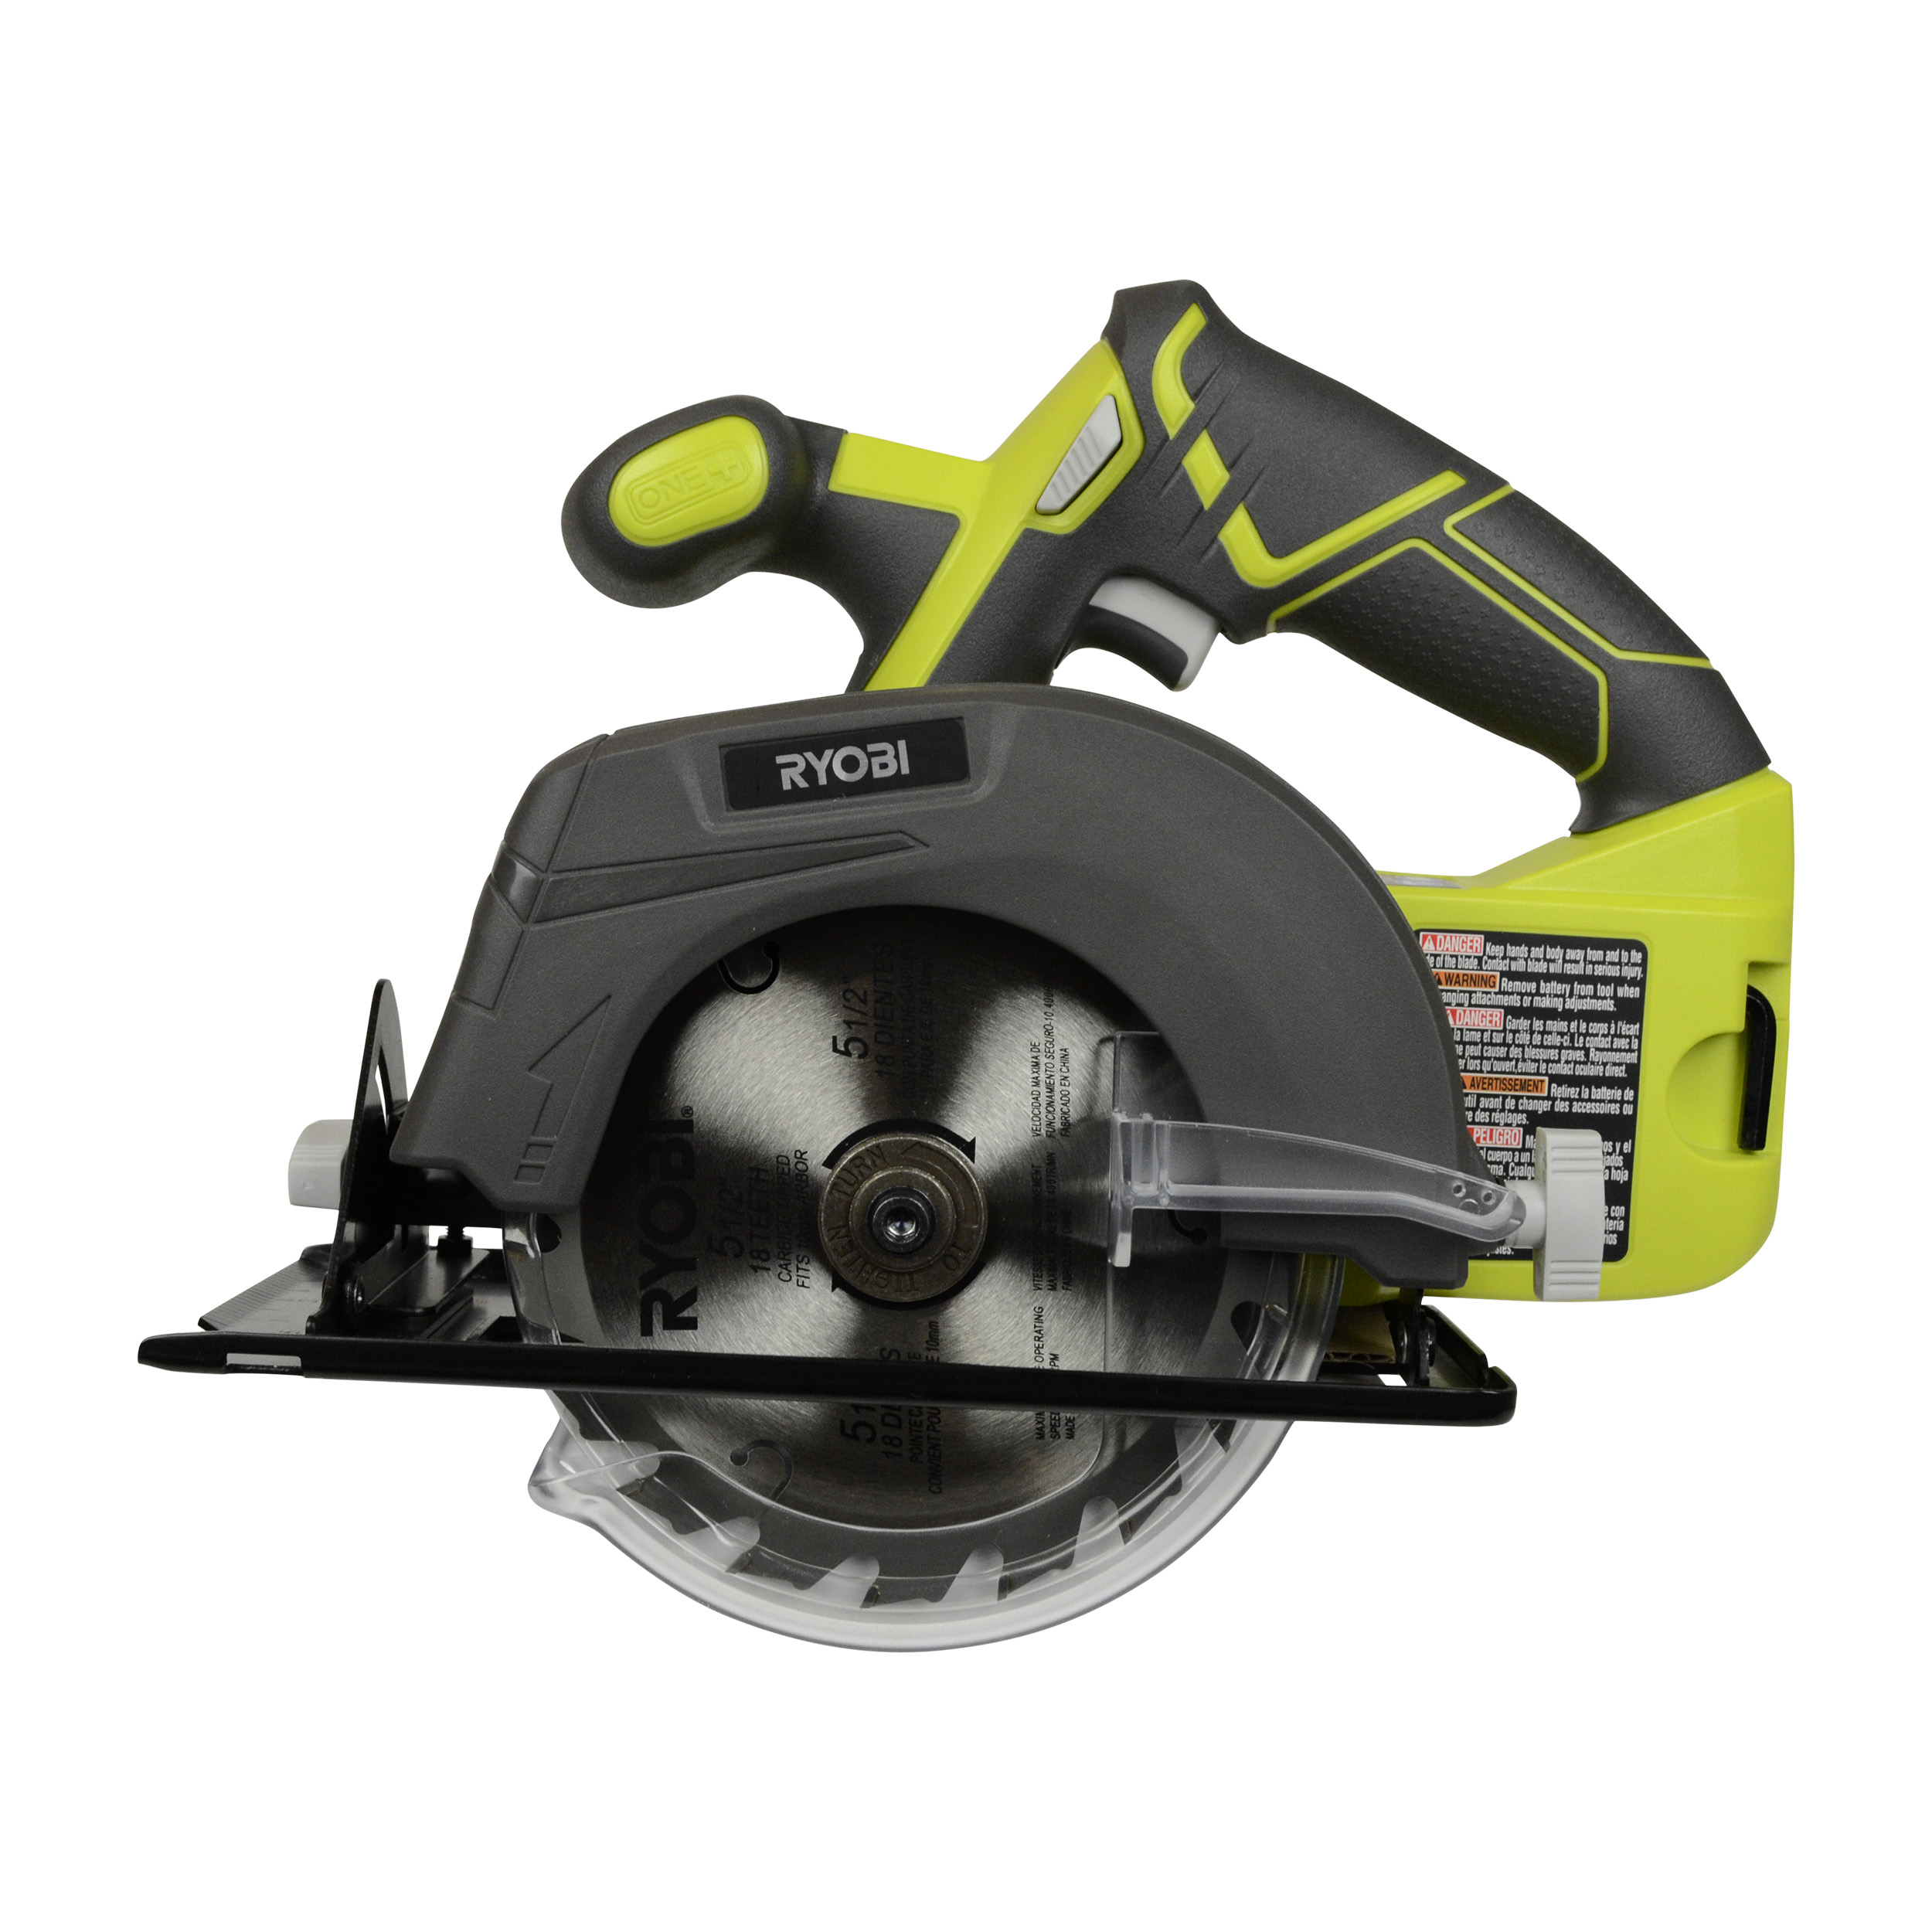 "Ryobi Tools P505 18V ONE+ 5-1 2"" Cordless Circular Saw, Tool Only by"